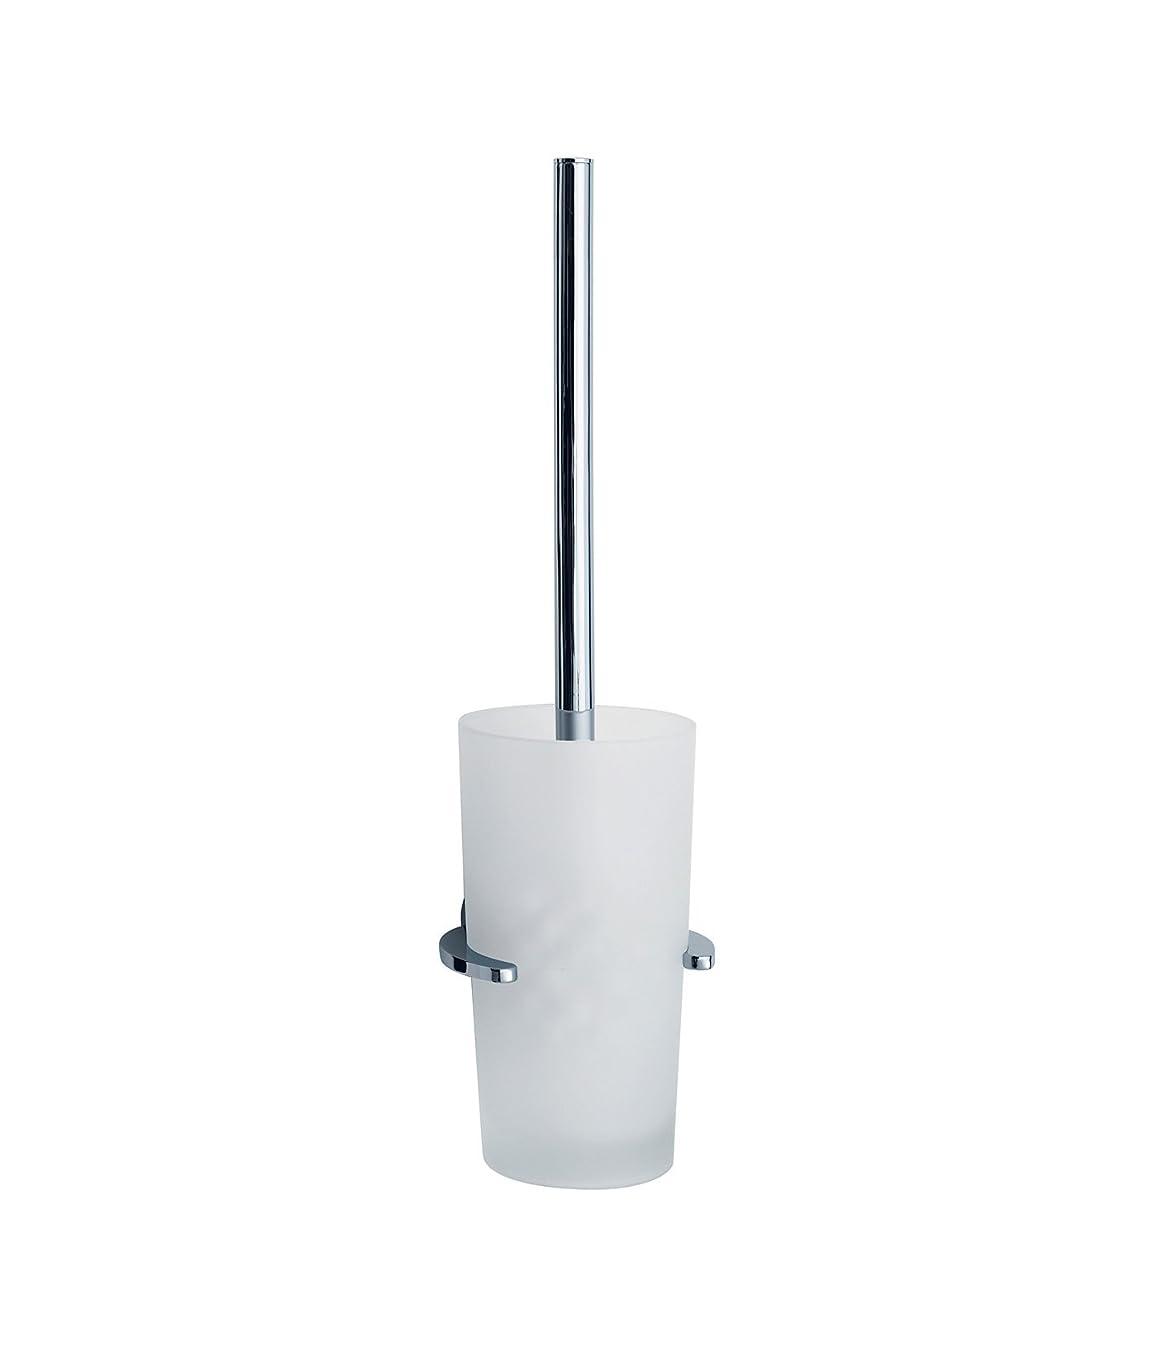 Smedbo SME LK333 Toilet Brush Wallmount, Polished Chrome